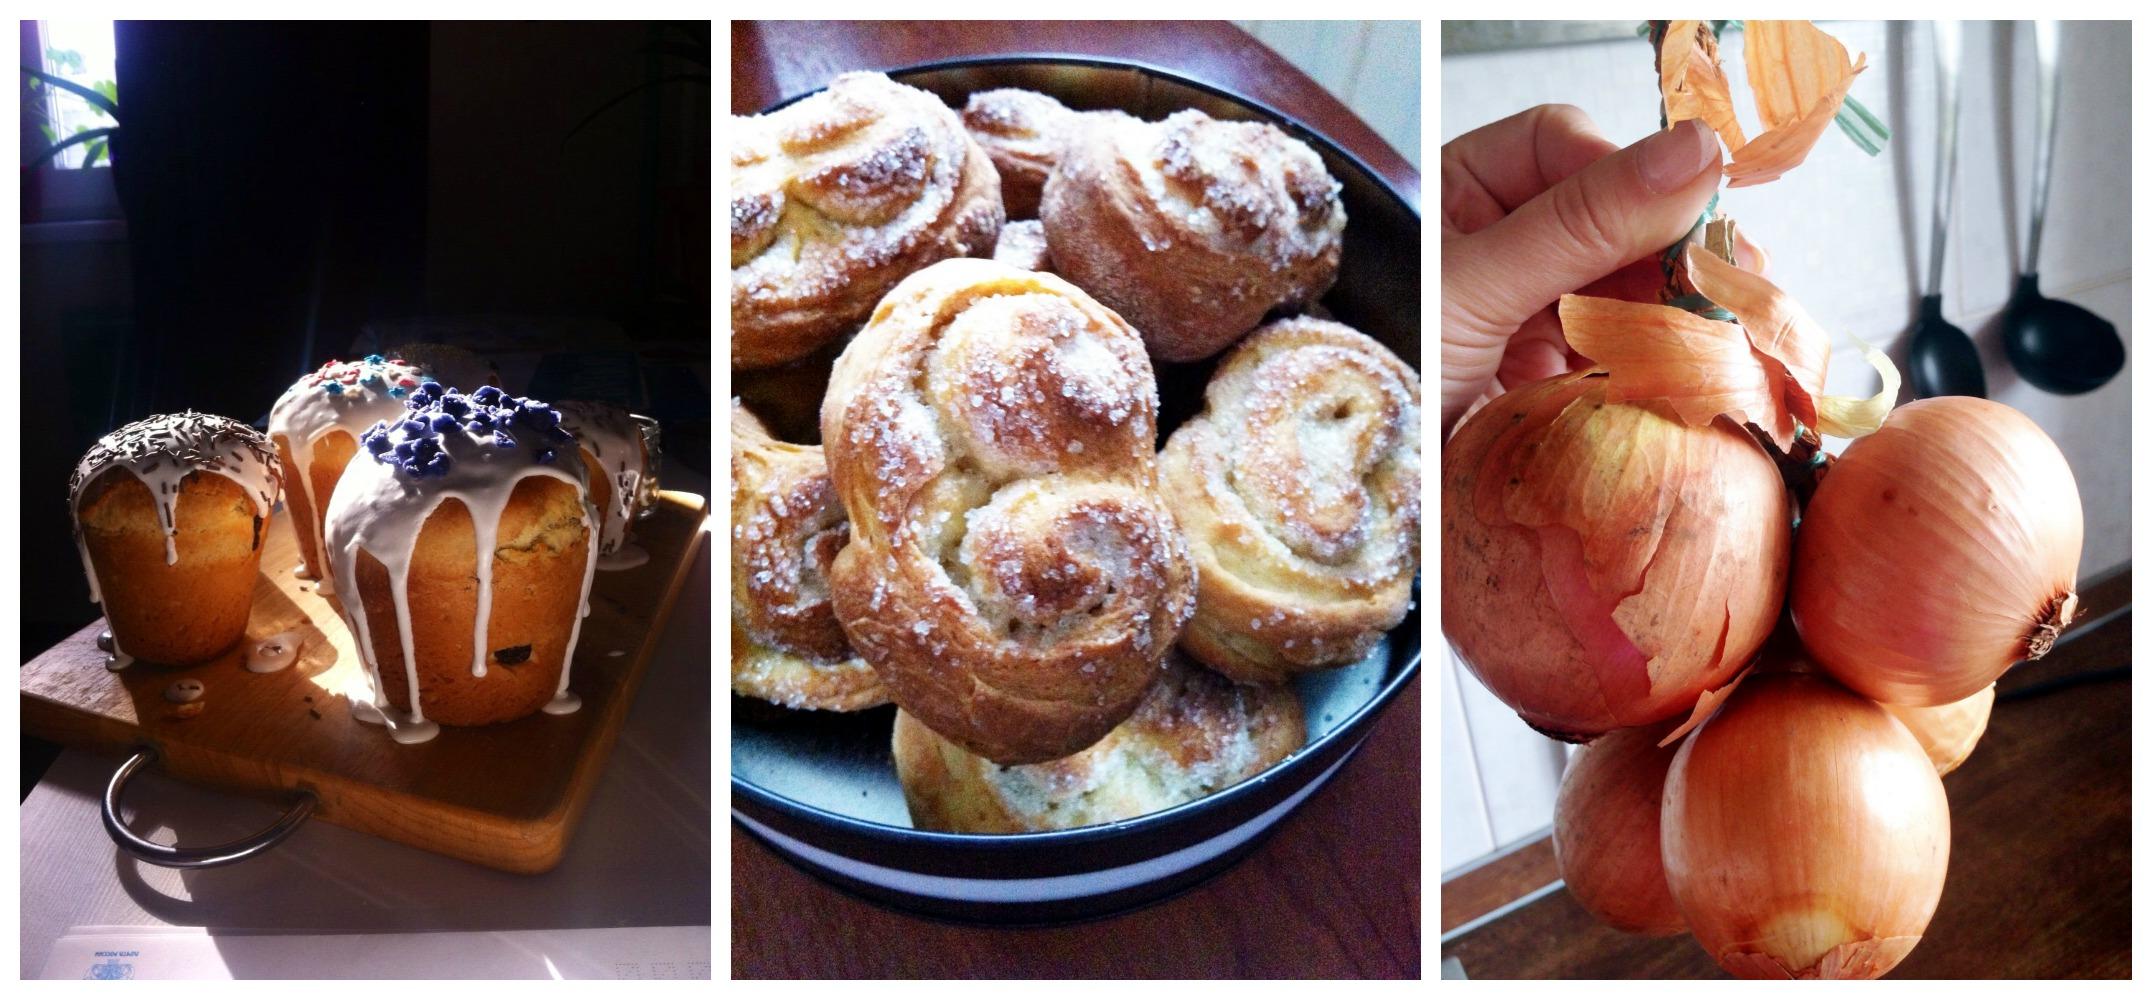 Как сделать булочки сердечки с сахаром фото 355